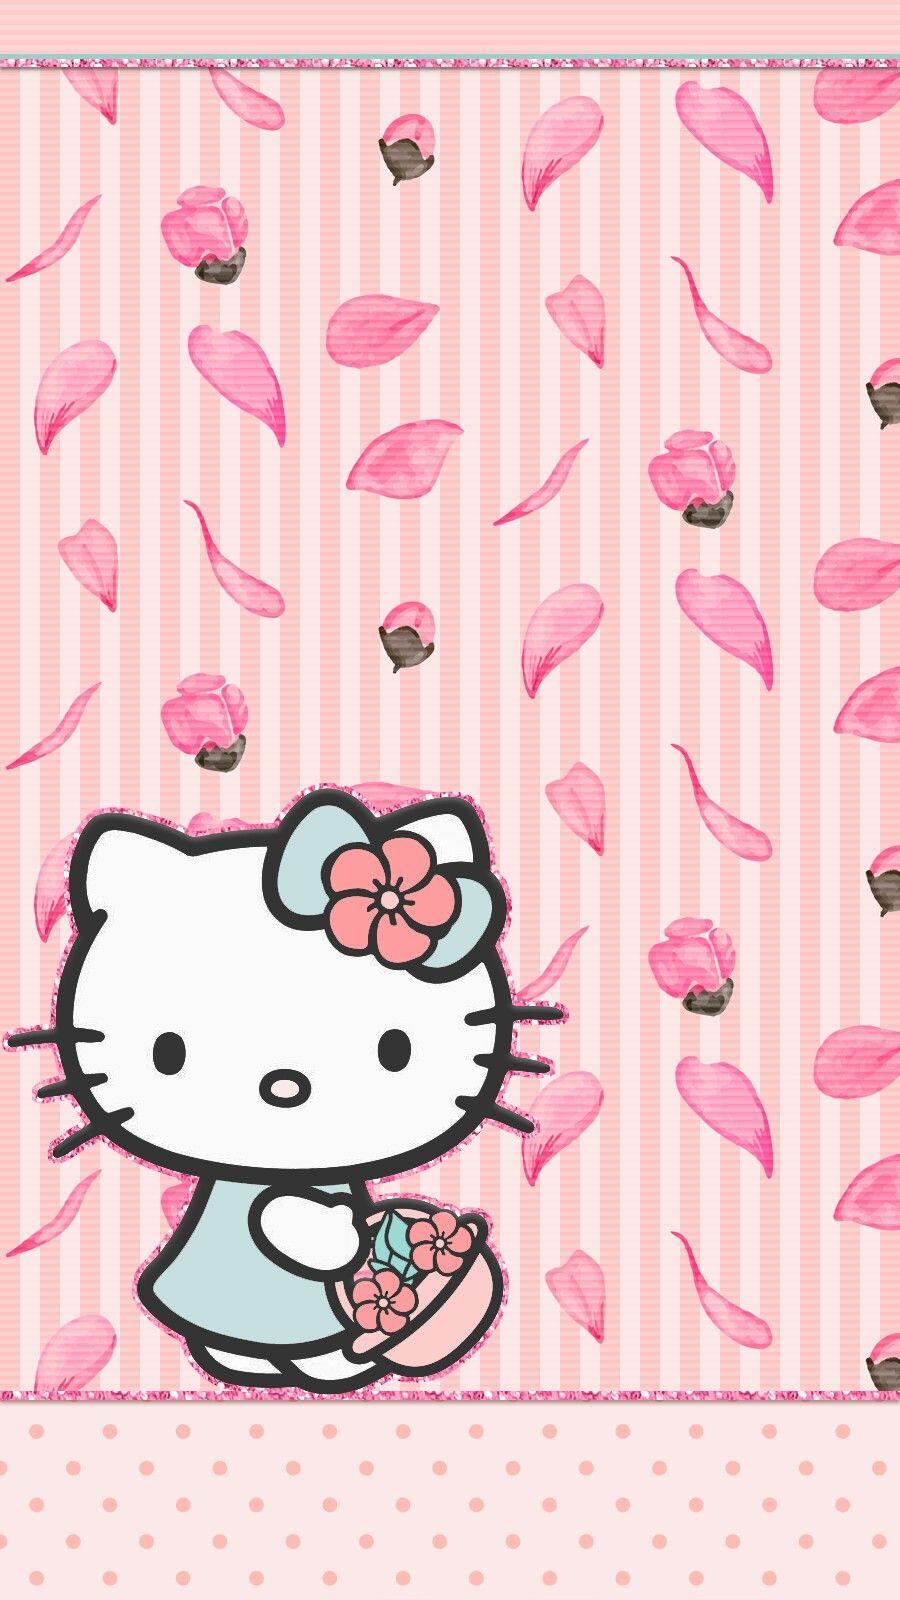 Top Wallpaper Hello Kitty Android - 641b9239d11bc710e9001f75f38f66b0  HD_904310.jpg